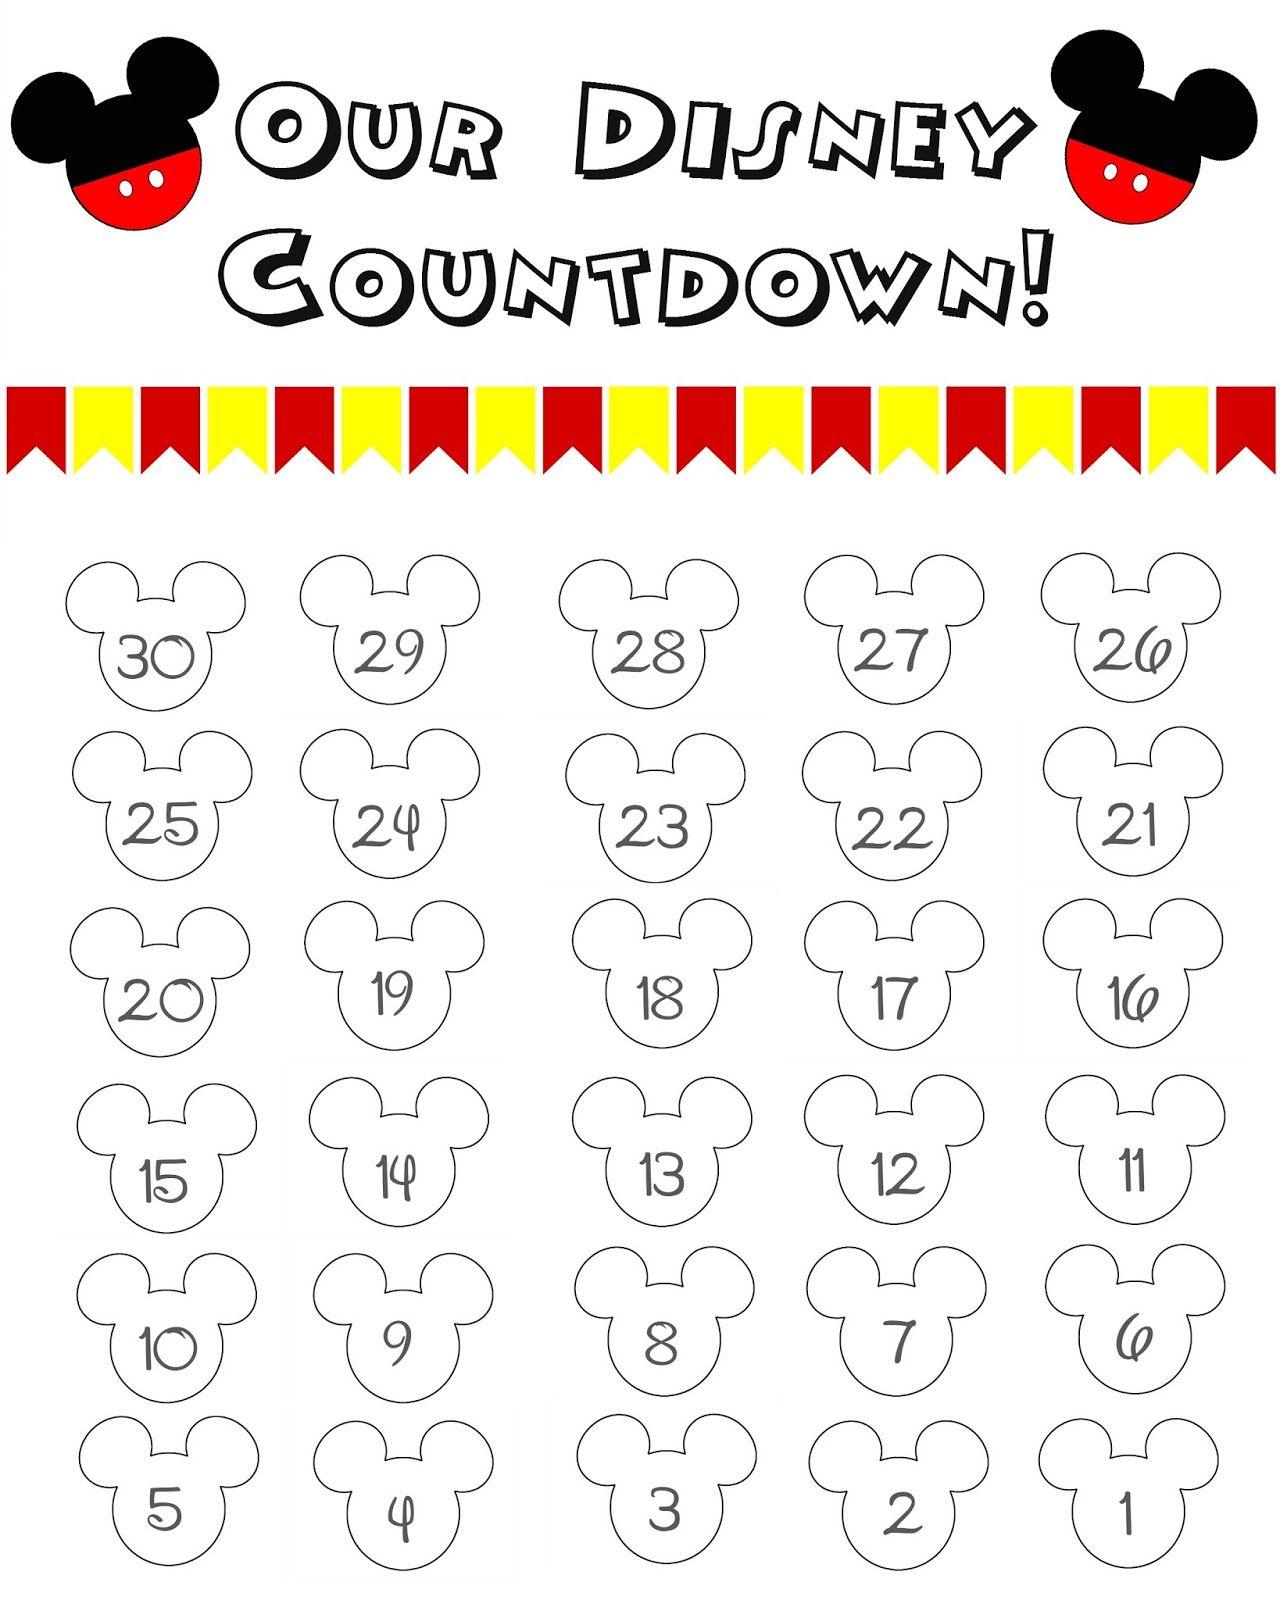 Disney World Countdown Calendar  Free Printable | Disney with regard to Disney World Countdown Calendar Printable